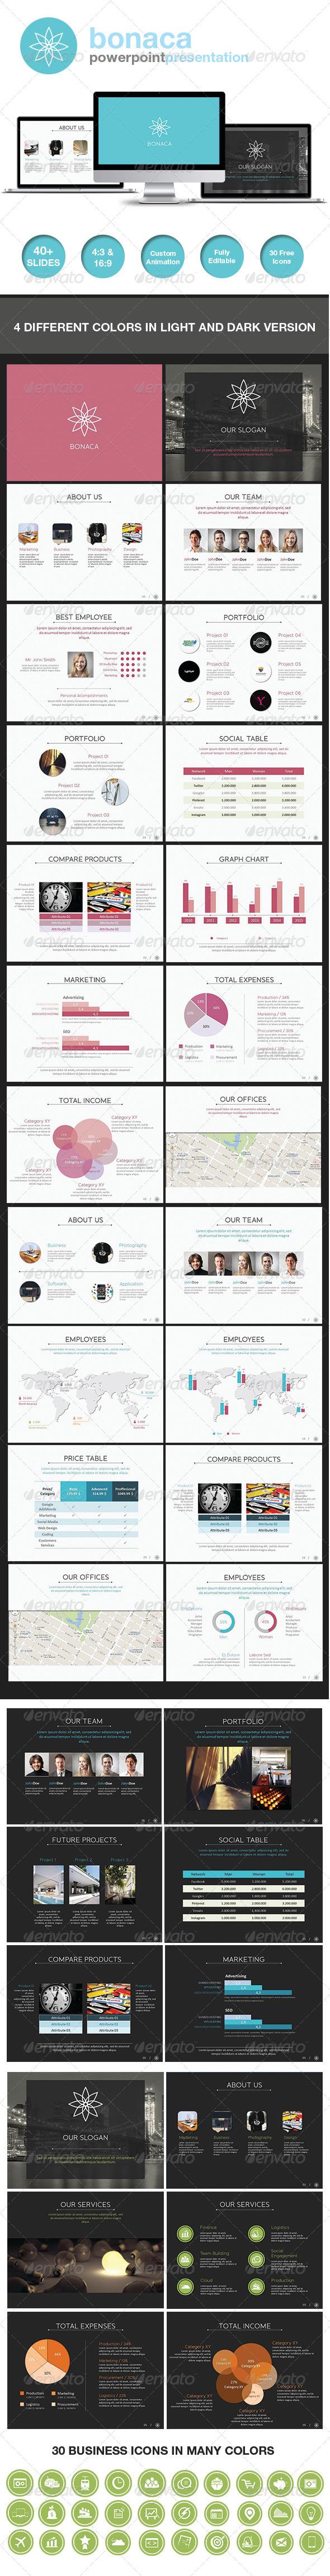 GraphicRiver Bonaca Powerpoint Presentation 6960295